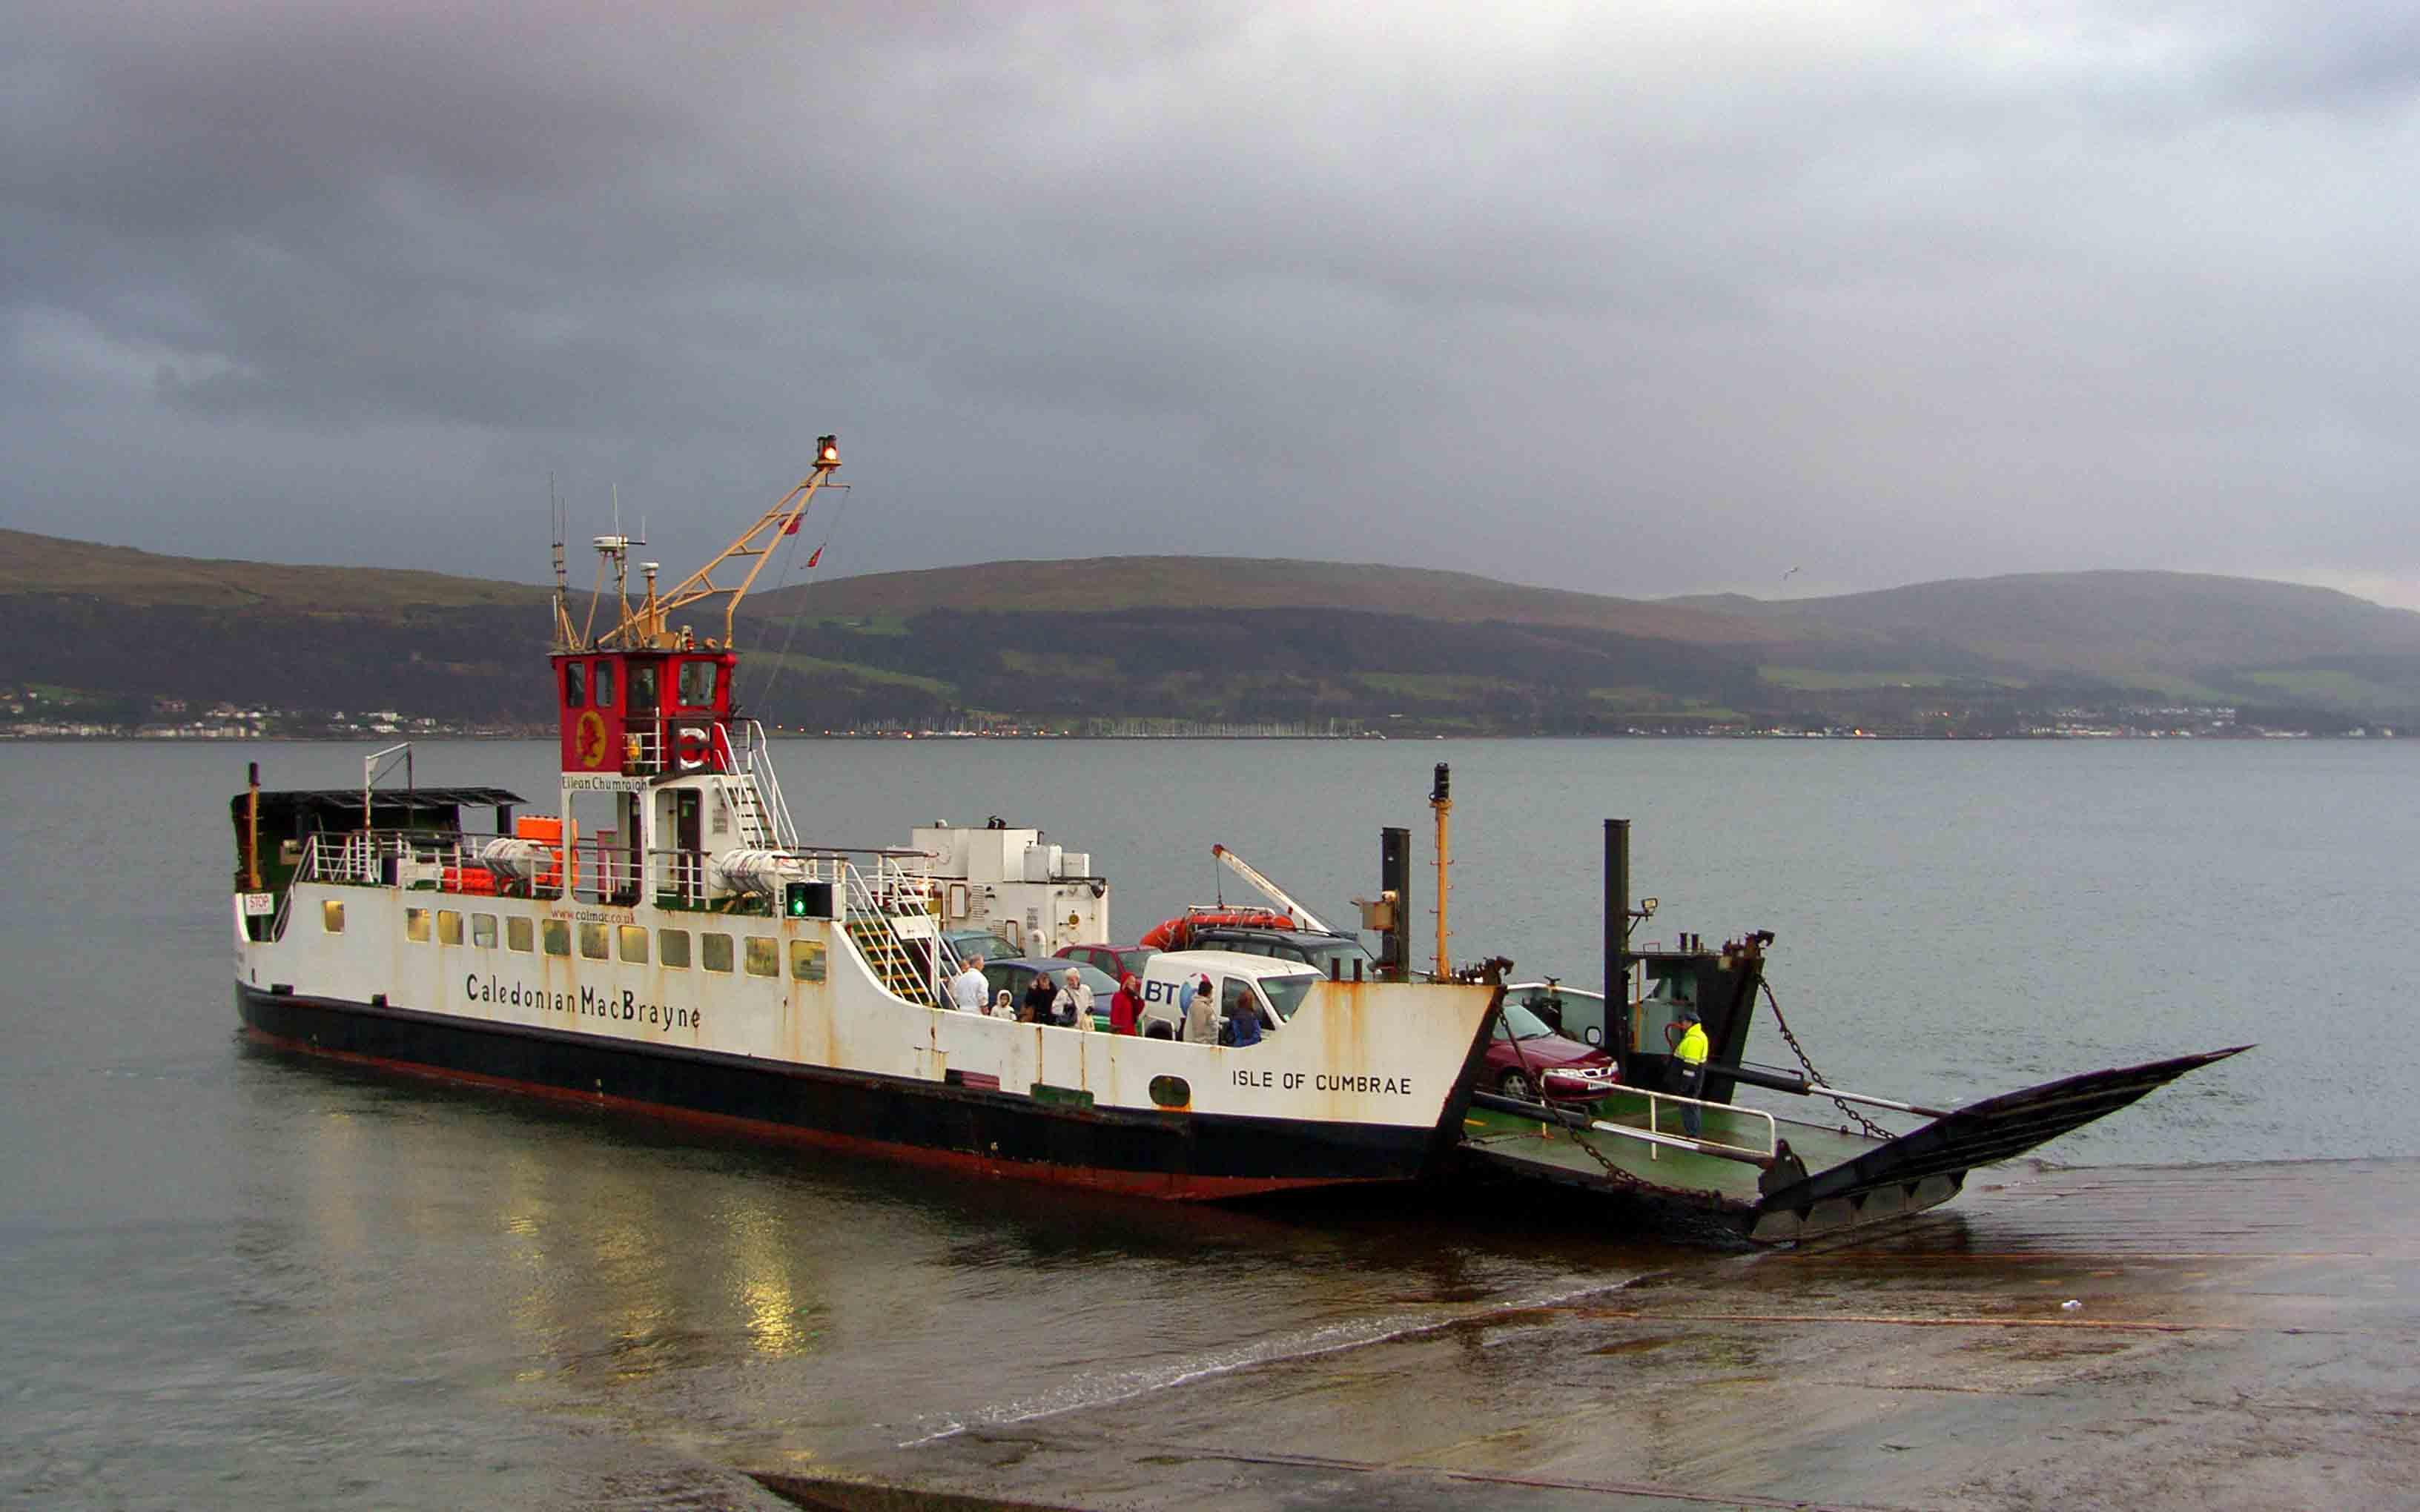 Isle of Cumbrae at Cumbrae Slip (Ships of CalMac)